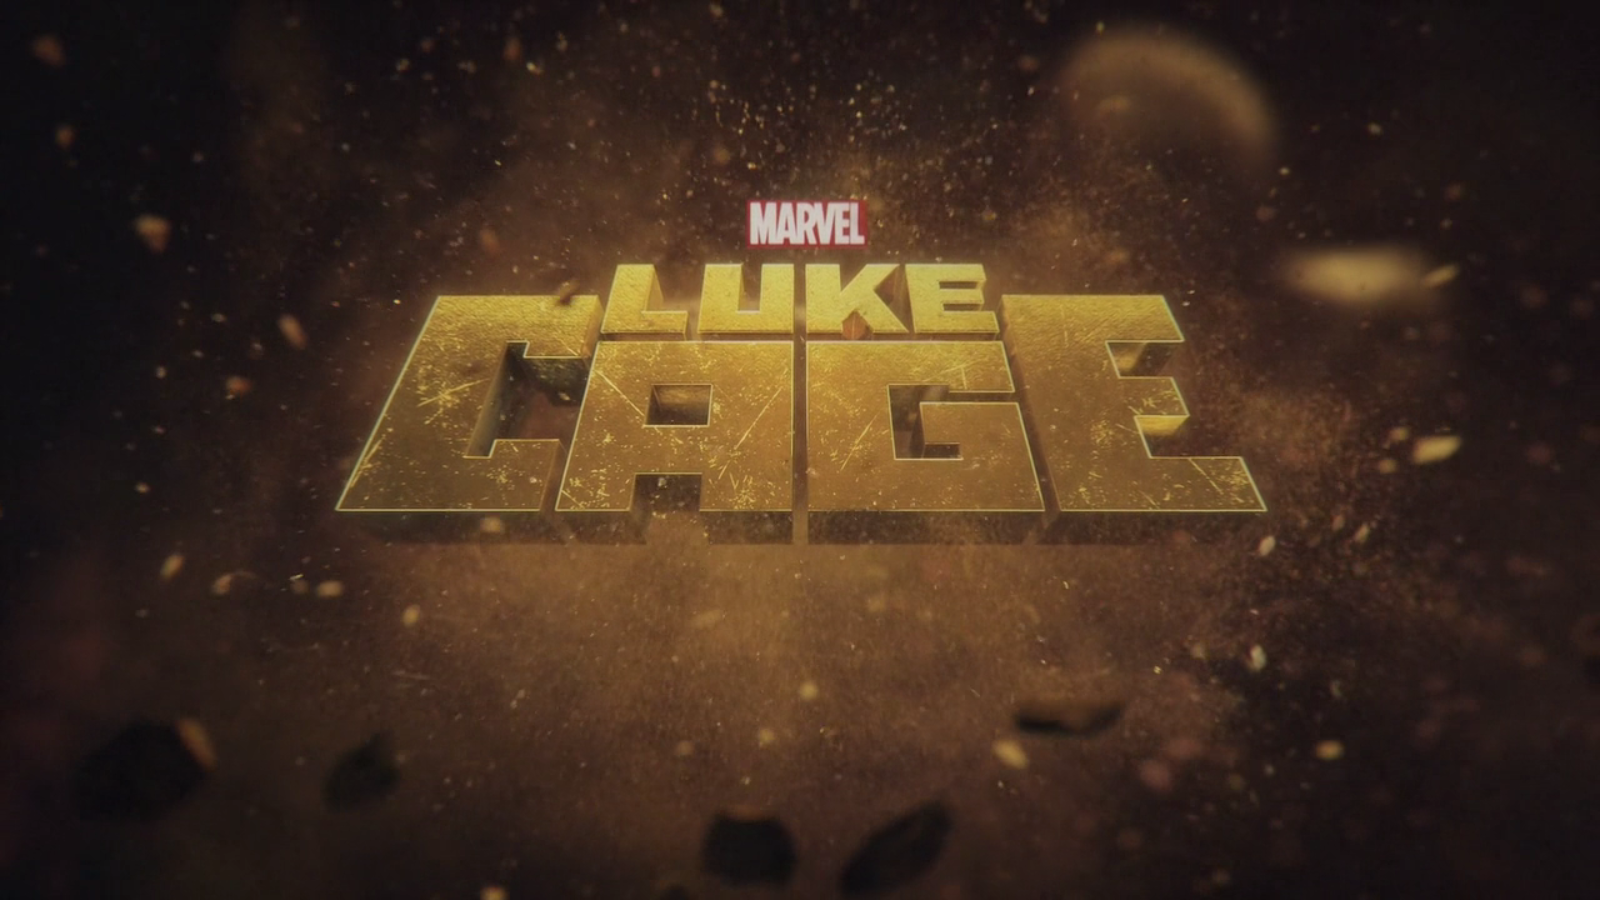 Luke Cage (TV series) | Marvel Cinematic Universe Wiki | FANDOM